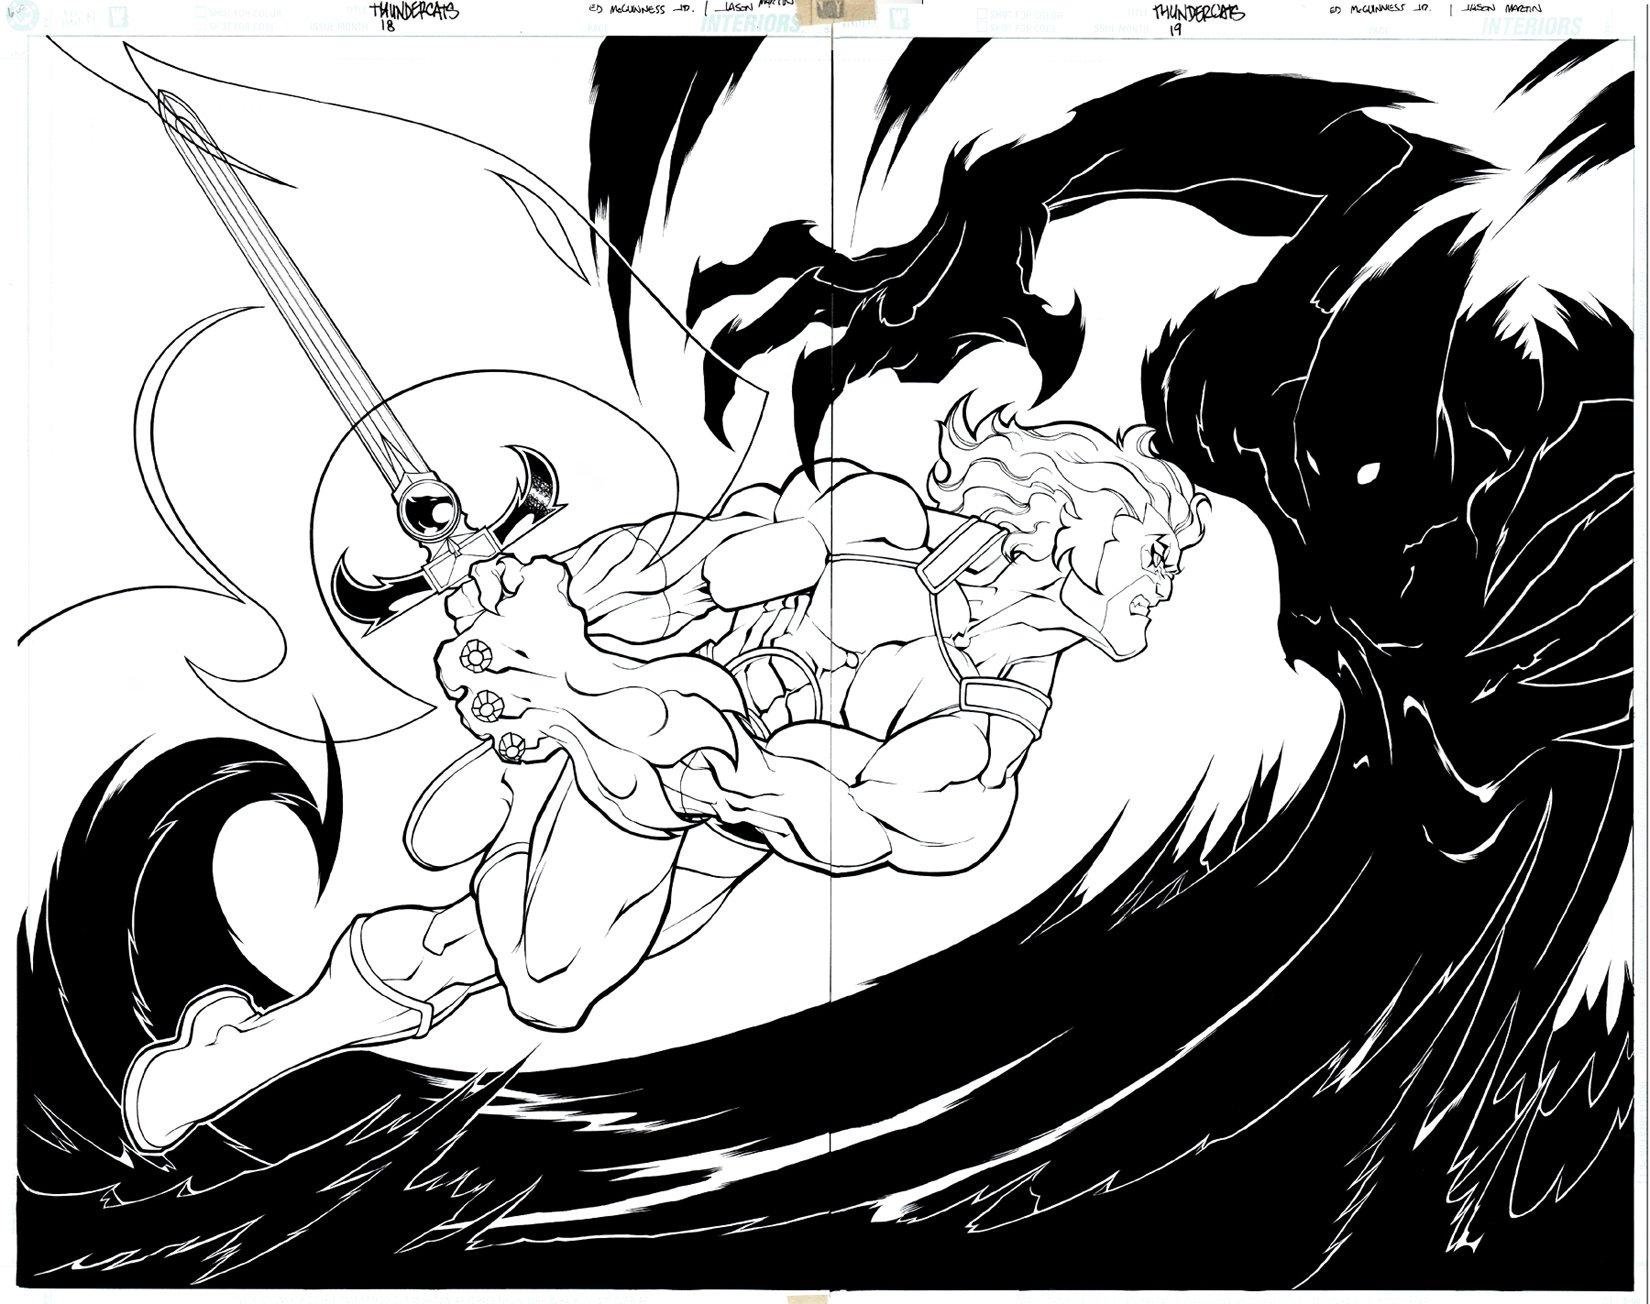 Thundercats #1 p 18-19 Double Spread Splash (Awesome Lion-O Battle!) 2002